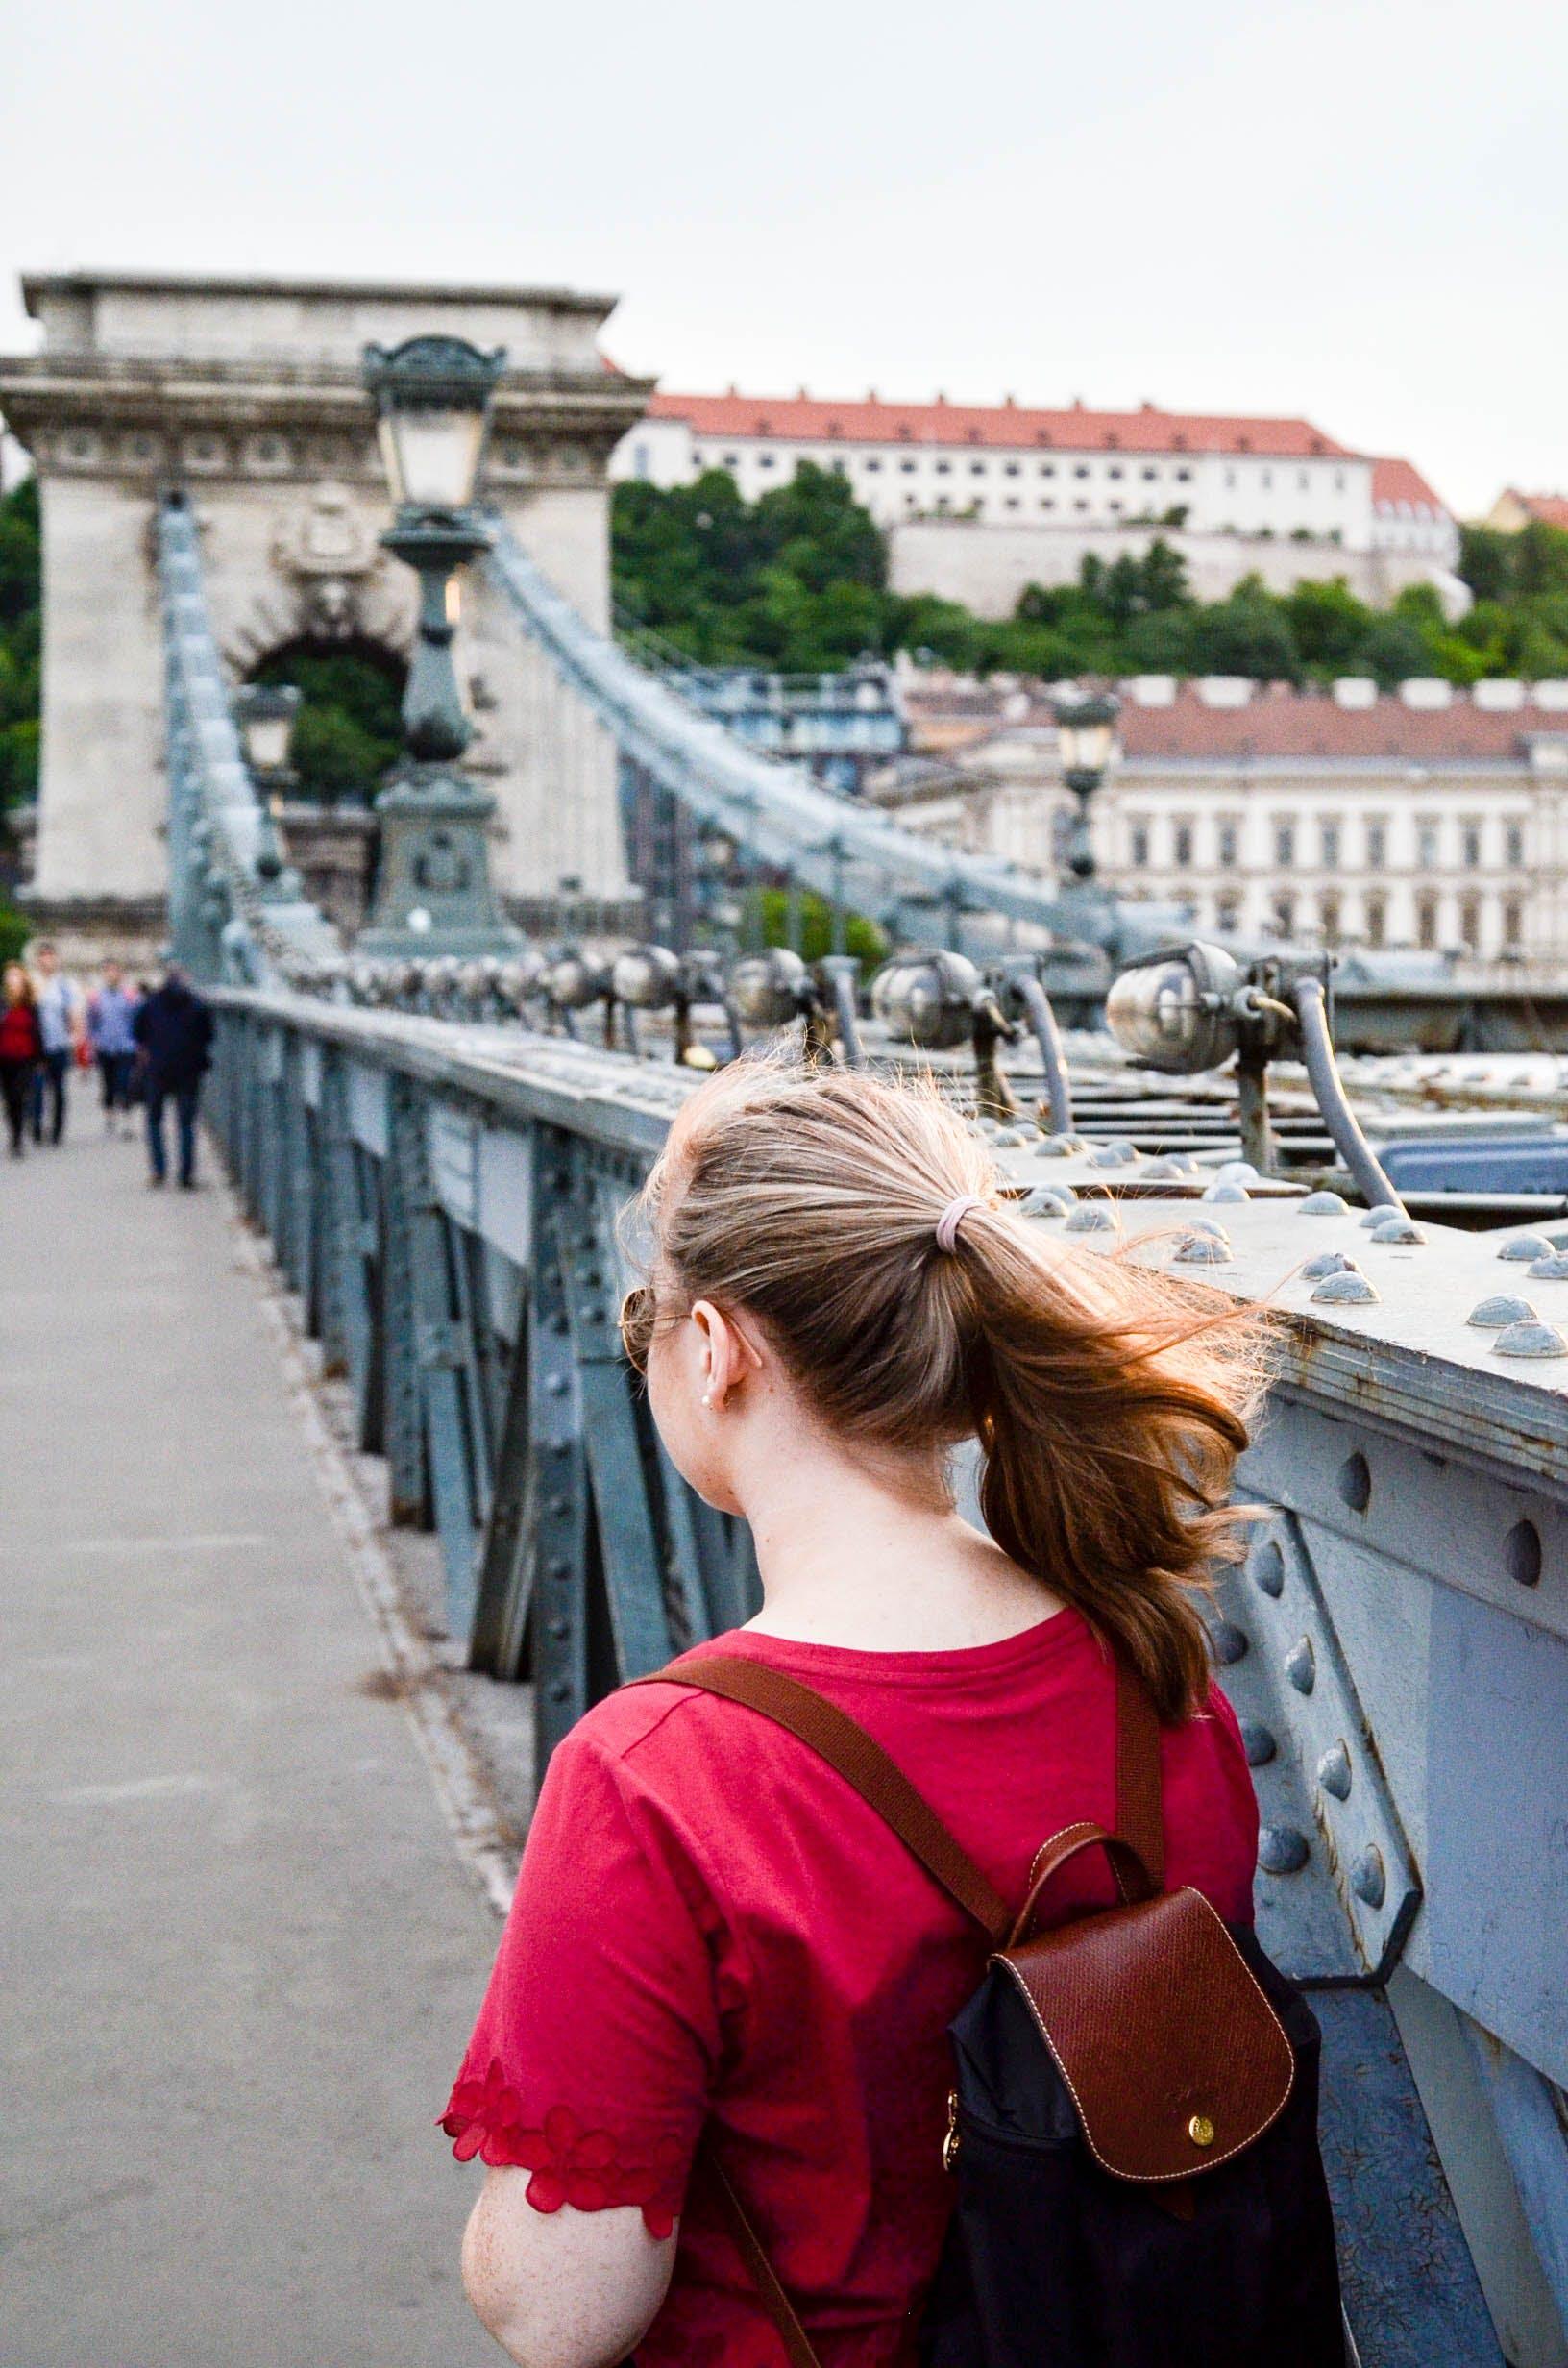 Woman Wearing Brown Leather Backpack Standing on Bridge Photo Taken